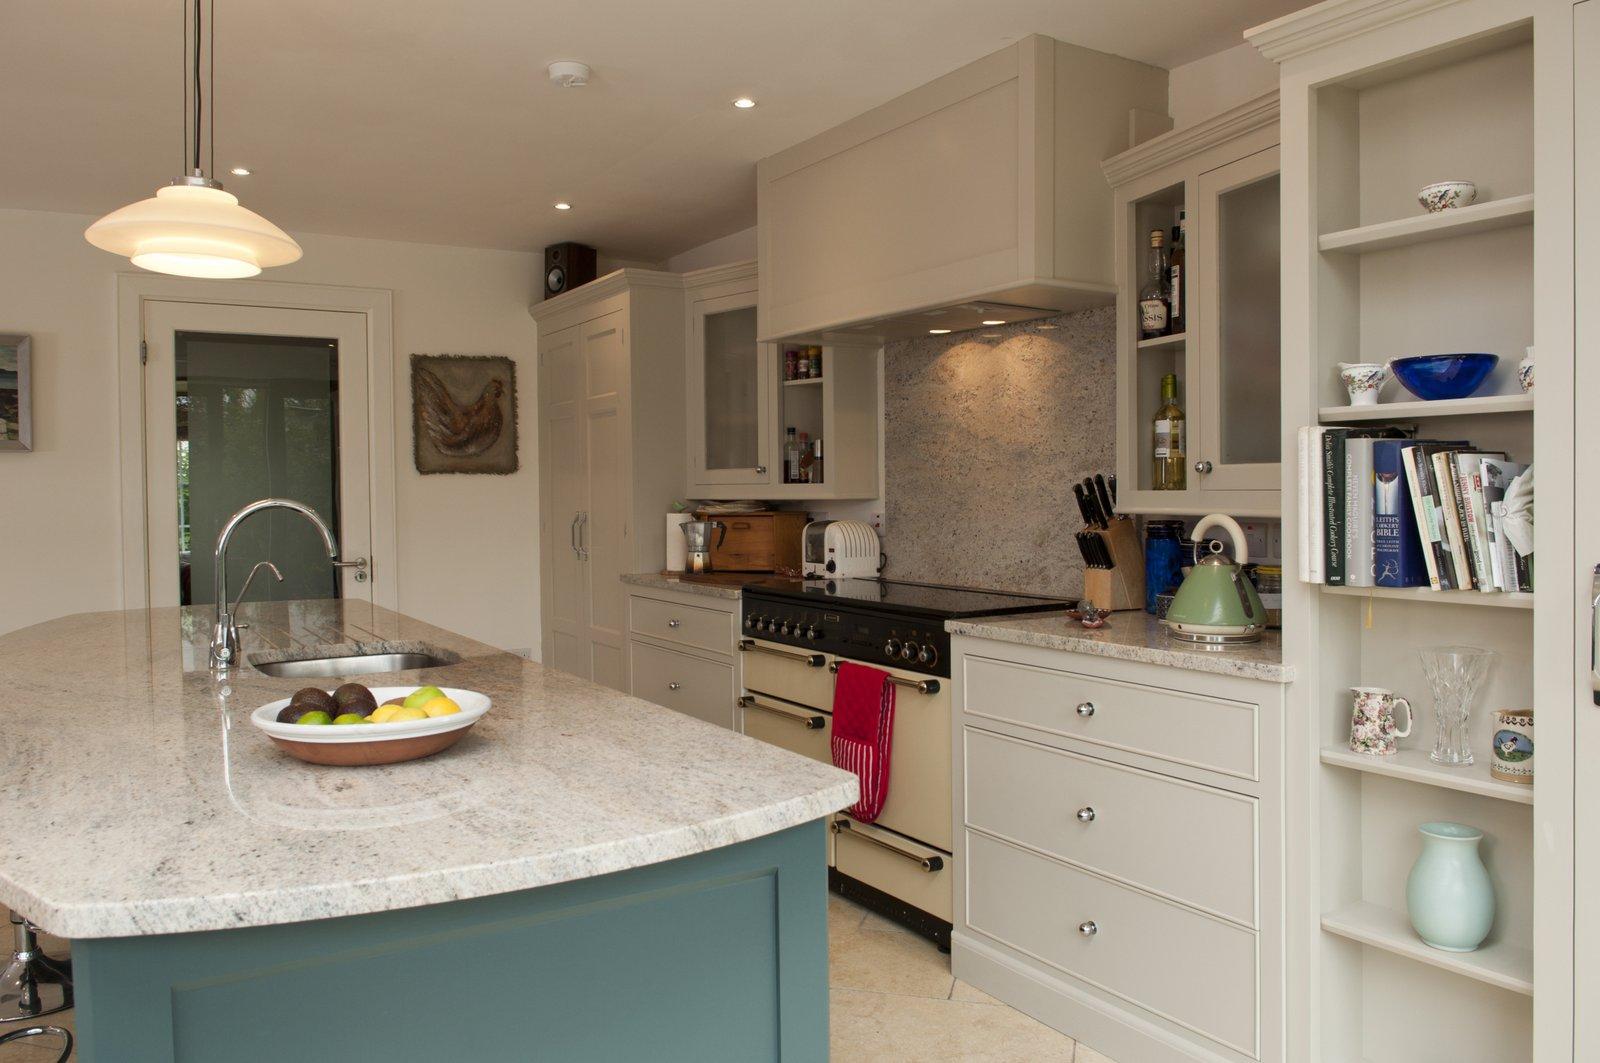 bespoke kitchen island.jpg